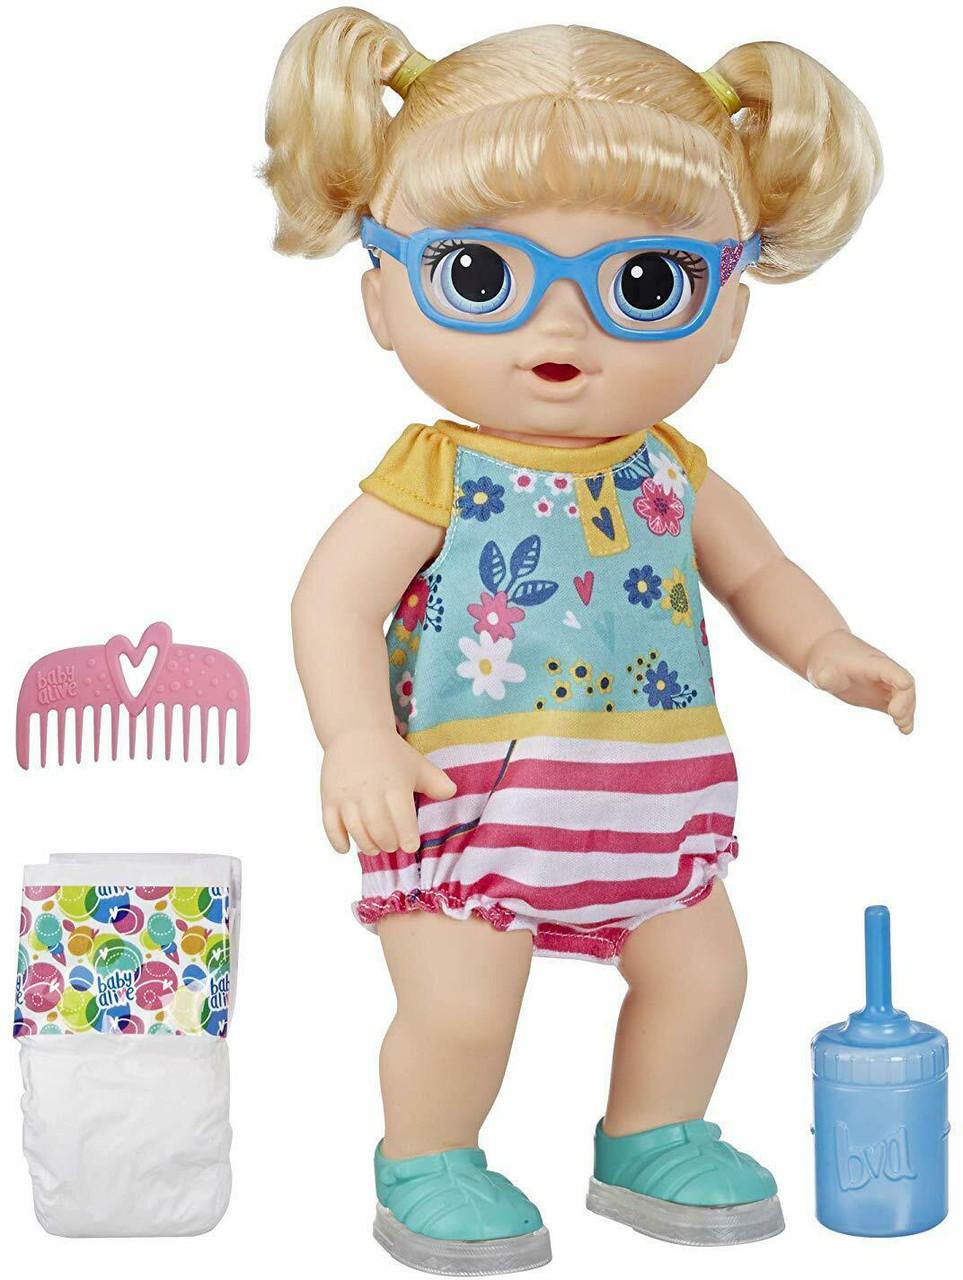 Hasbro BABY ALIVE Kукла Беби Элайв Малышка Блонди Умеет Ходить